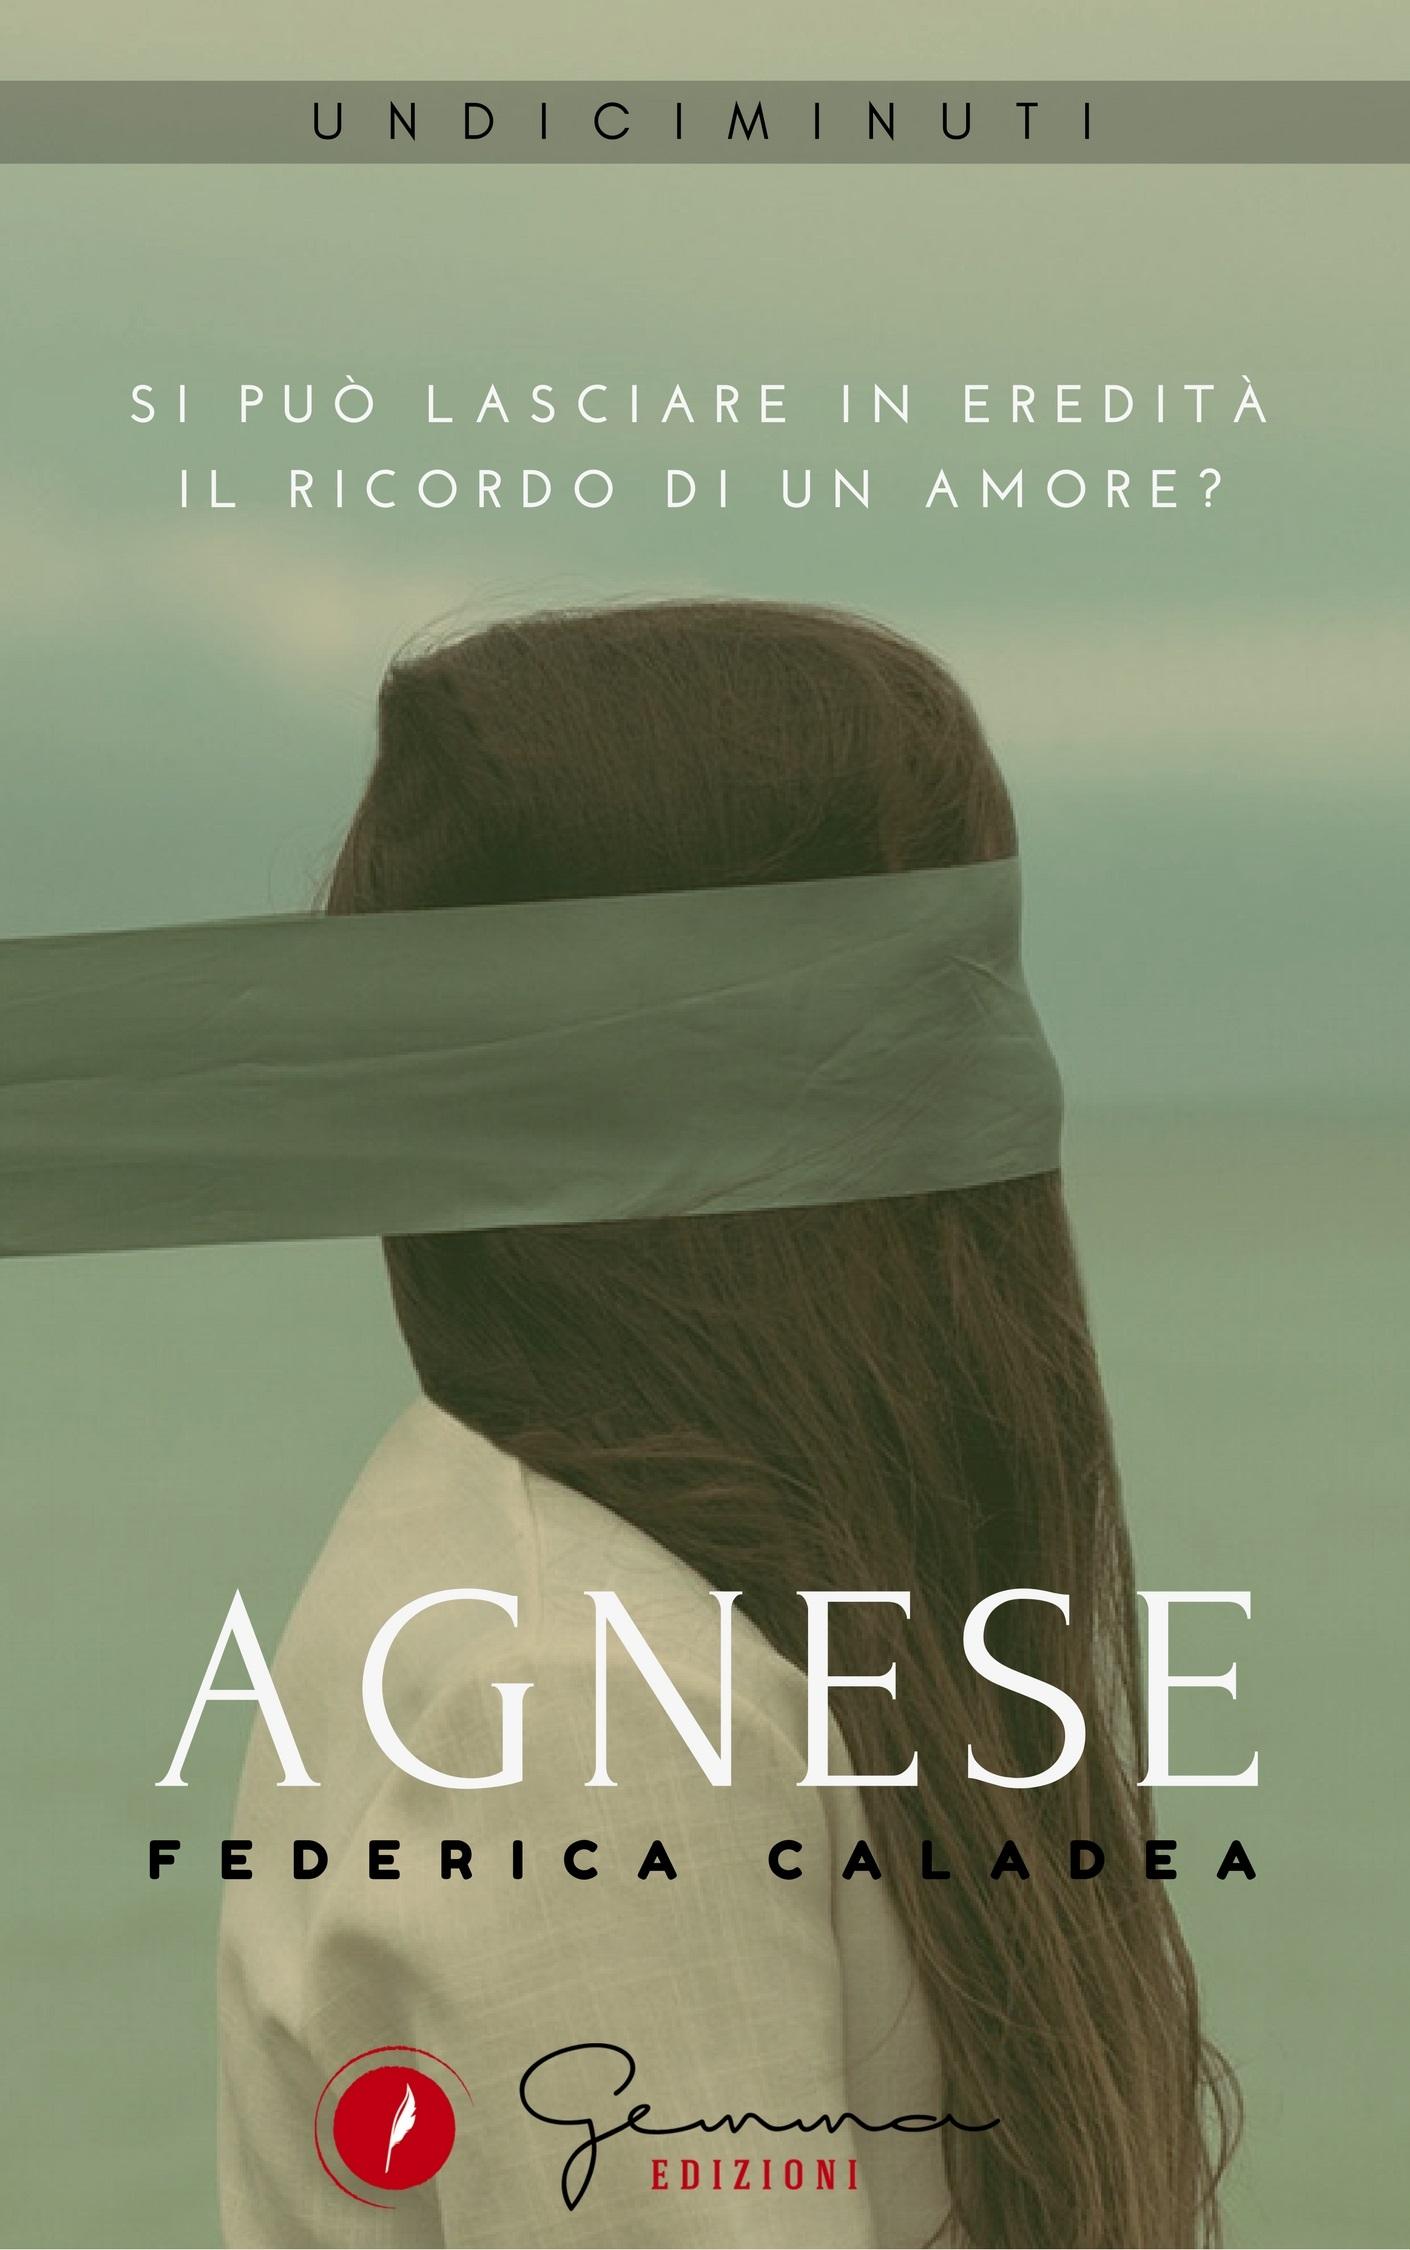 agnese.jpg